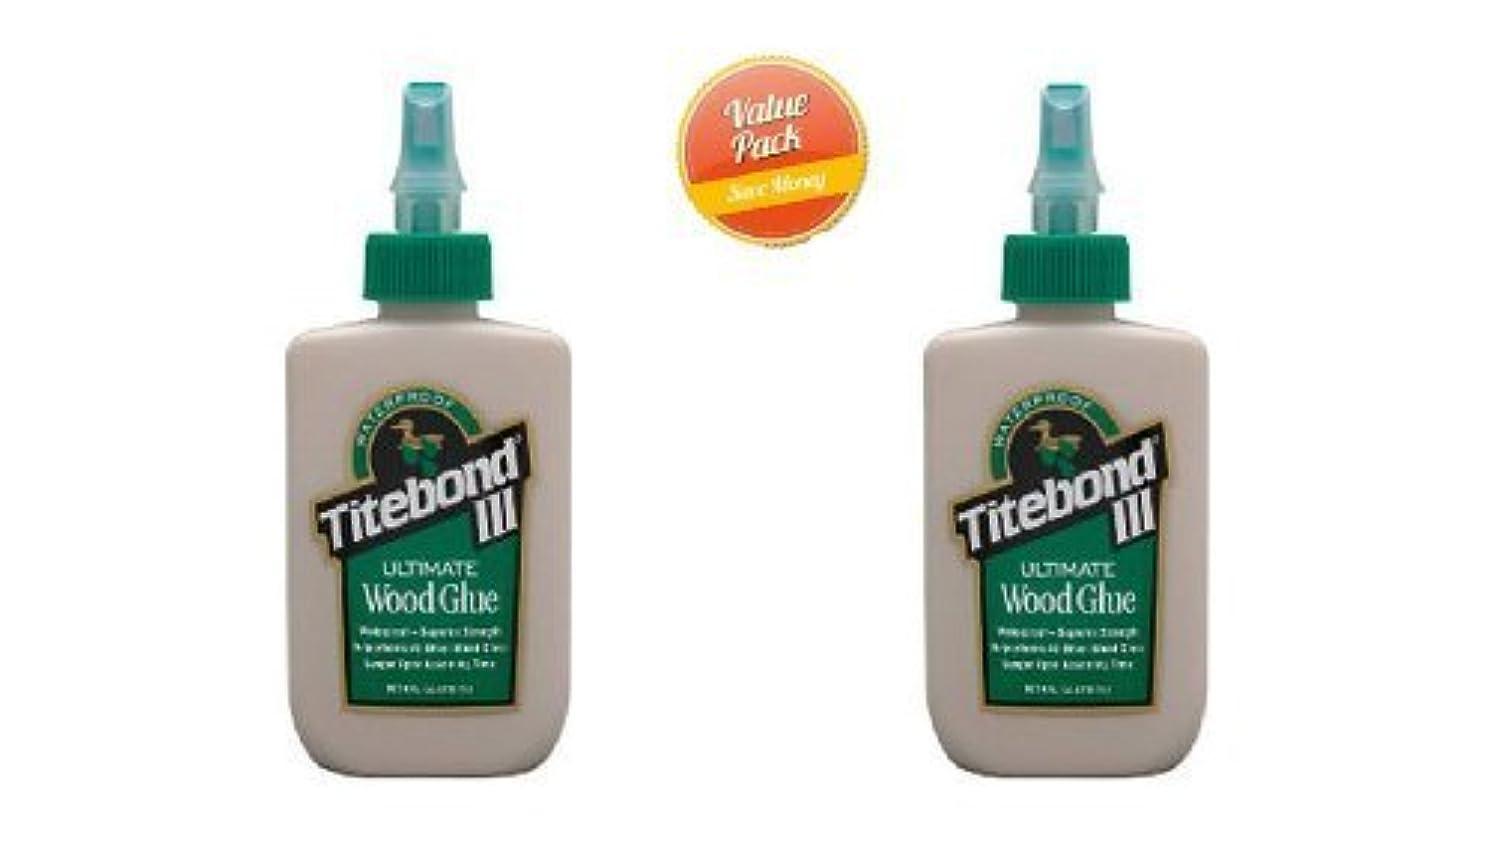 Waterproof Titebond III Wood Glue (Pack of 2) by Franklin International